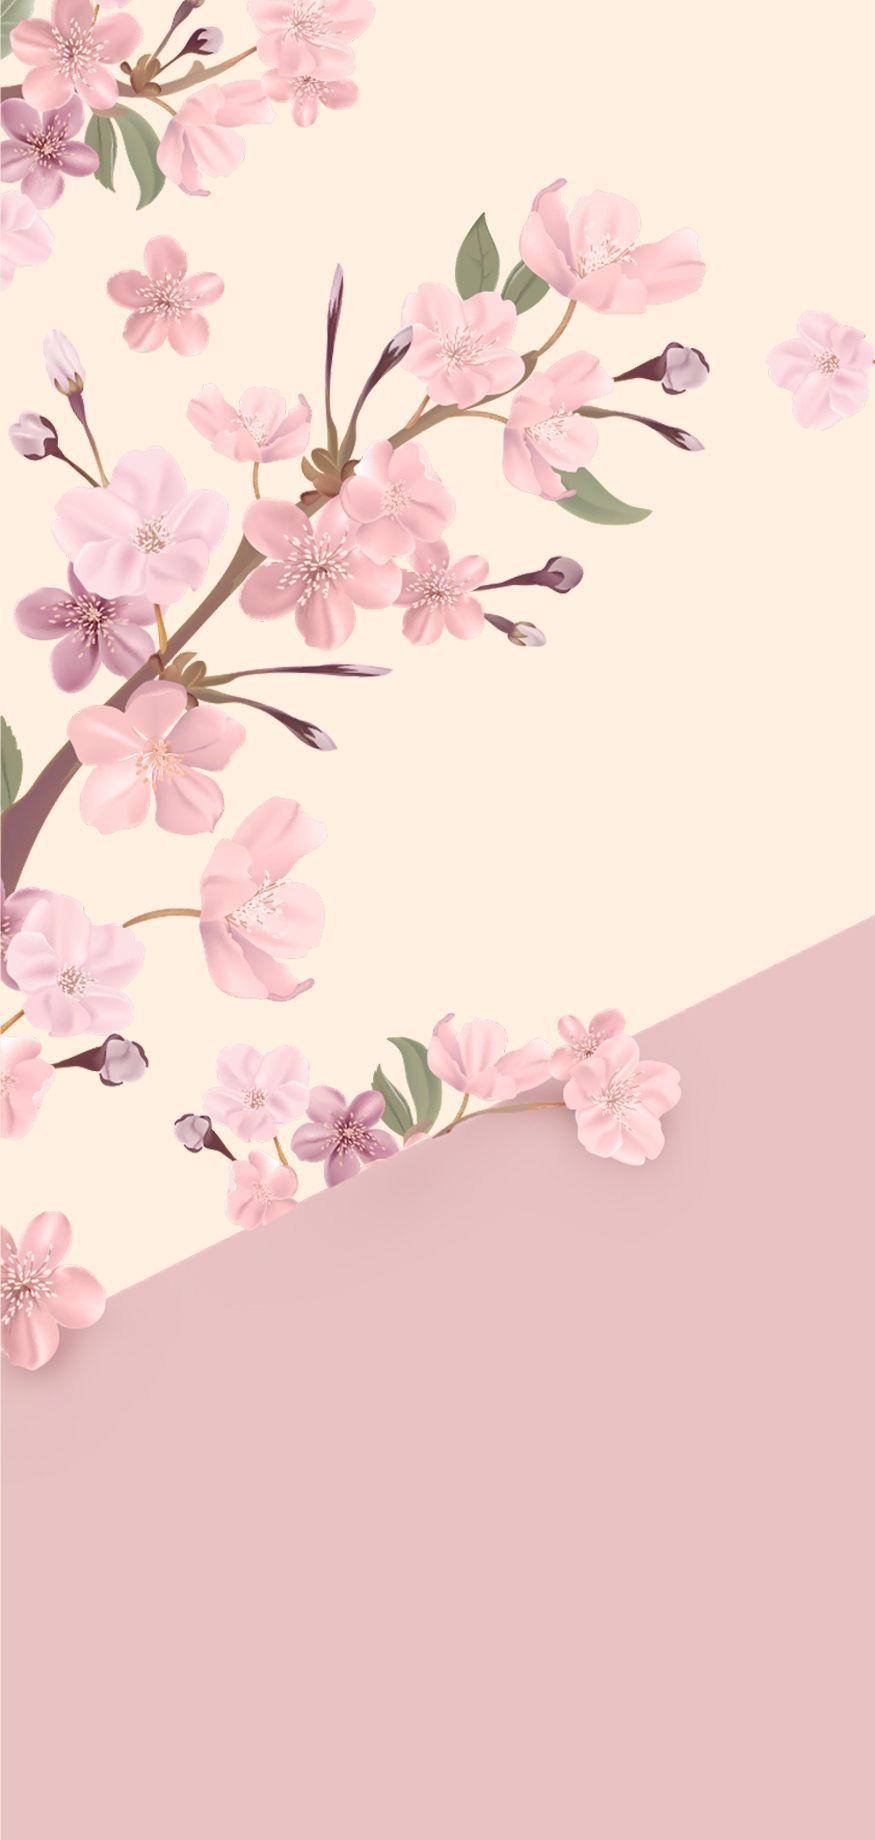 #gocase #lovegocase #wallpaper #lockscreenwallpaper #phonebackgrounds #iphonebac… | Imagem de fundo para iphone, Papel de parede floral, Papel de parede cor de rosa